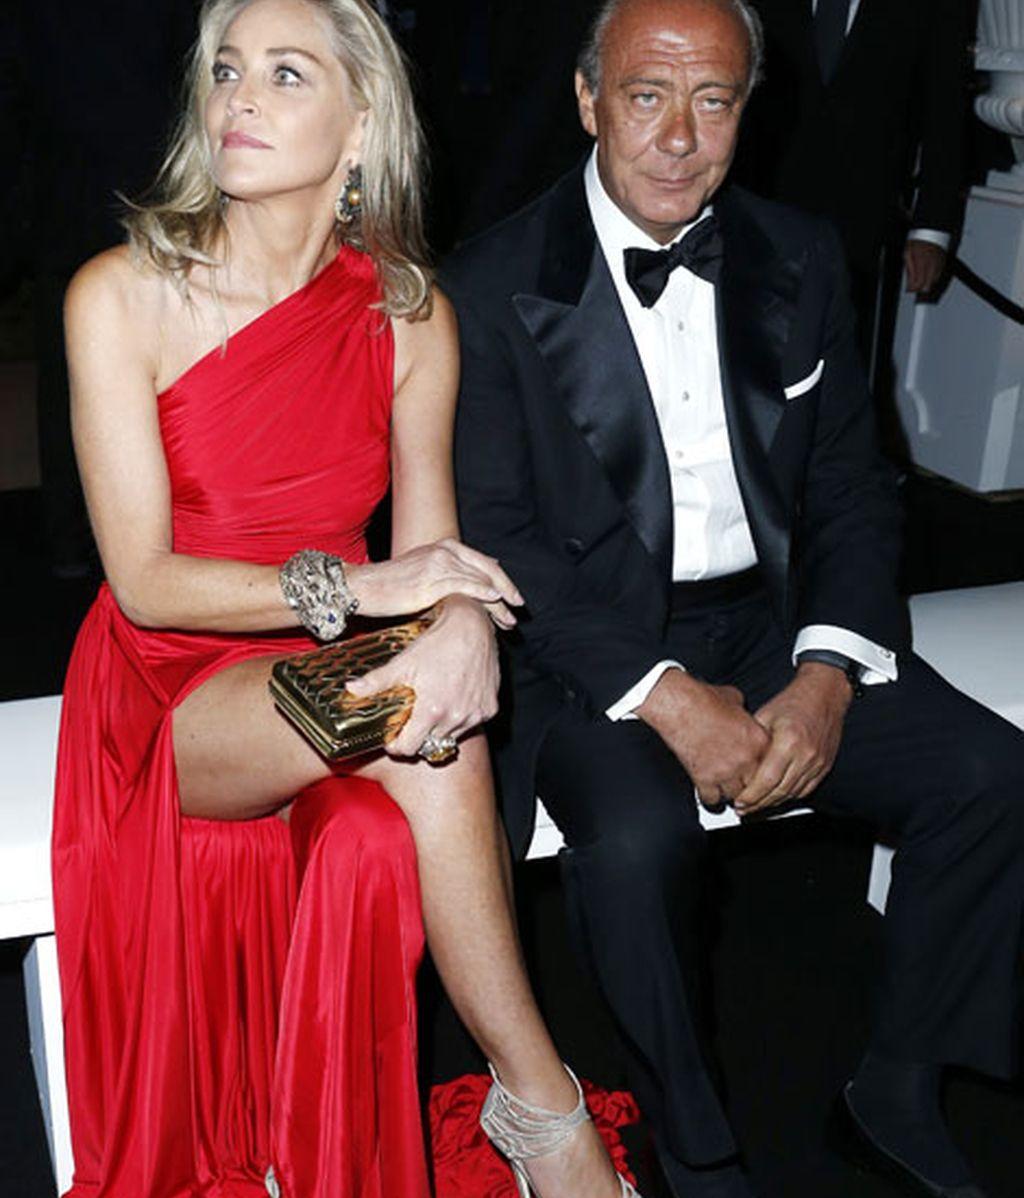 Sharon Stone y Fawaz Gruosi en la fiesta de Grisogono